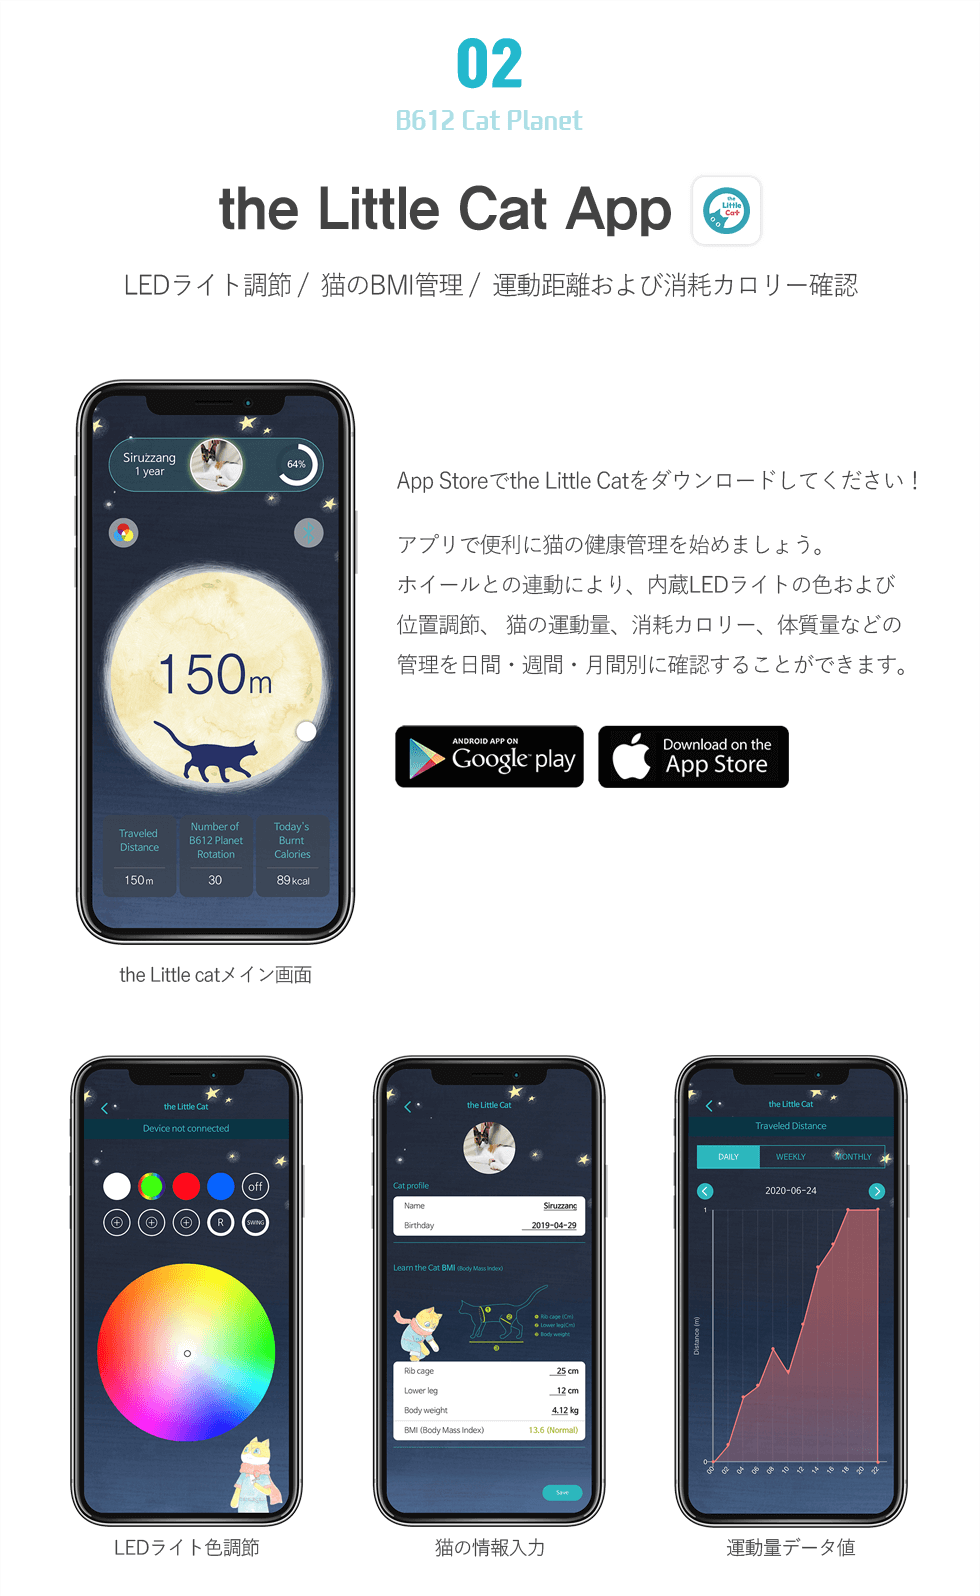 japan_detail_05_01.png